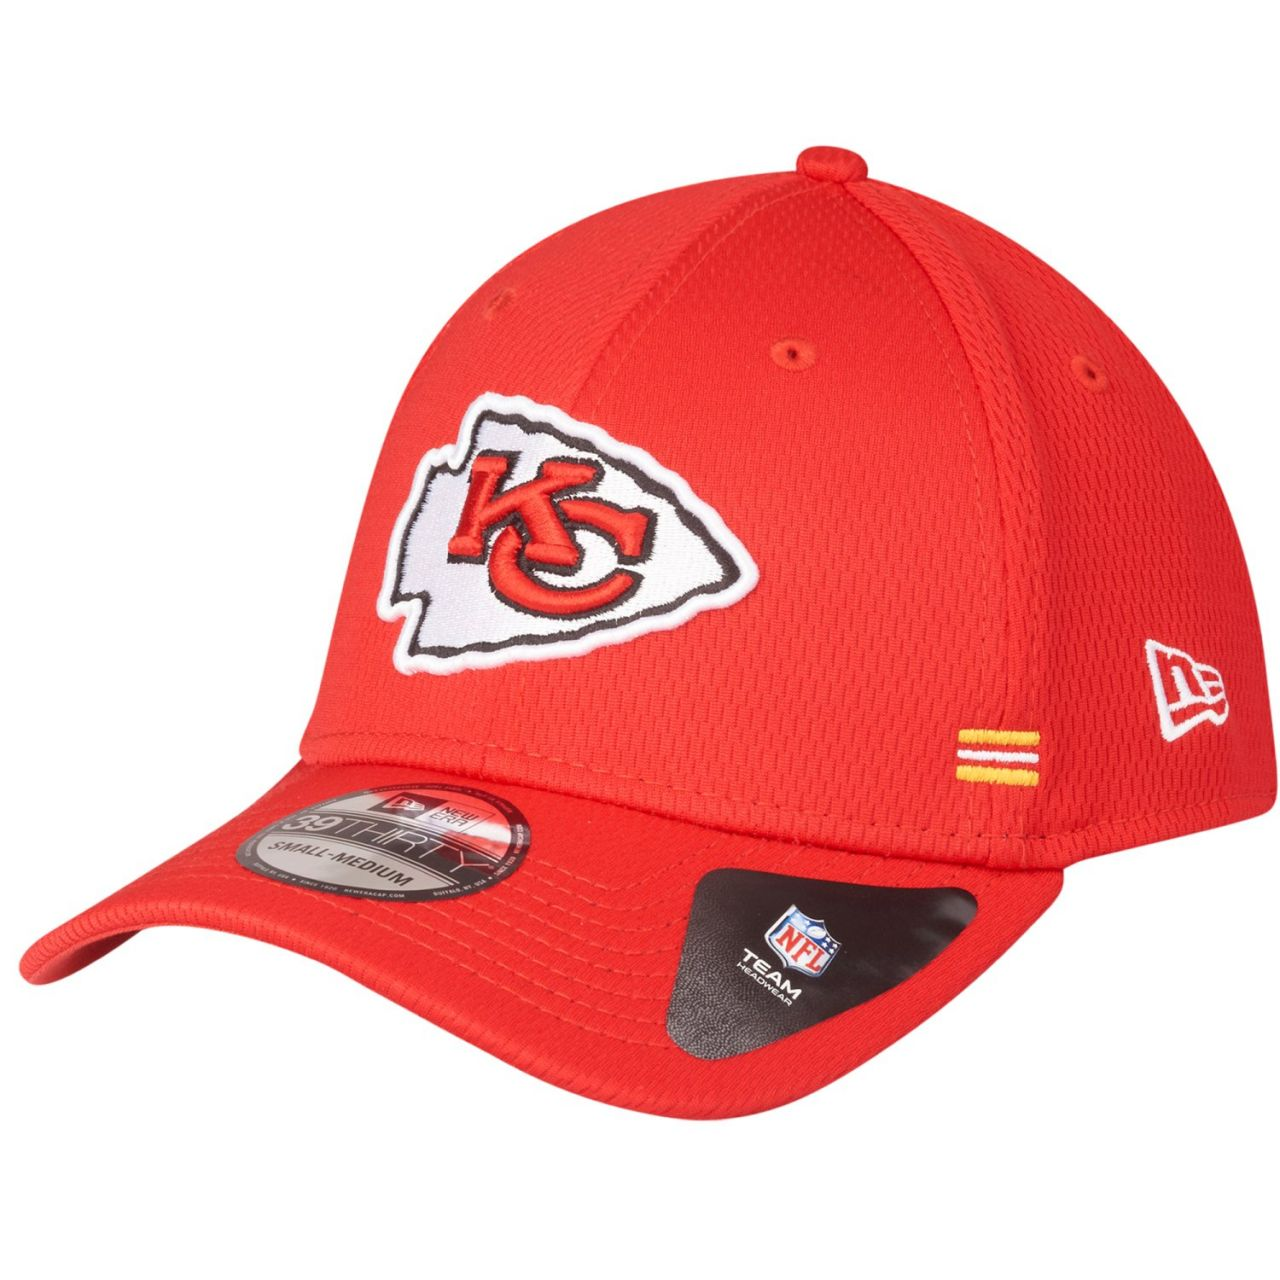 amfoo - New Era 39Thirty Cap - HOMETOWN Kansas City Chiefs